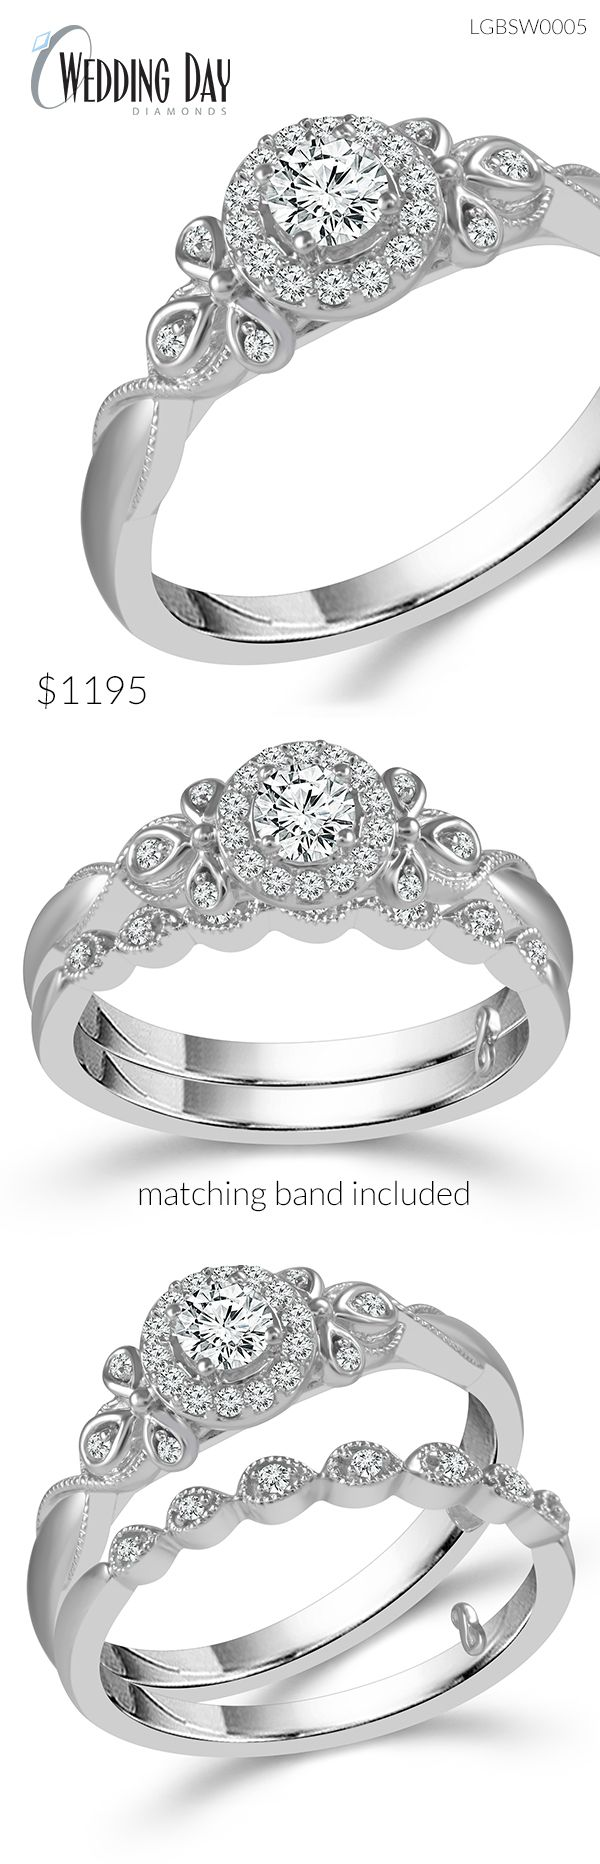 Pin By Wedding Day Diamonds On Affinity Collection Wedding Rings Engagement Engagement Rings Wedding Day Diamonds